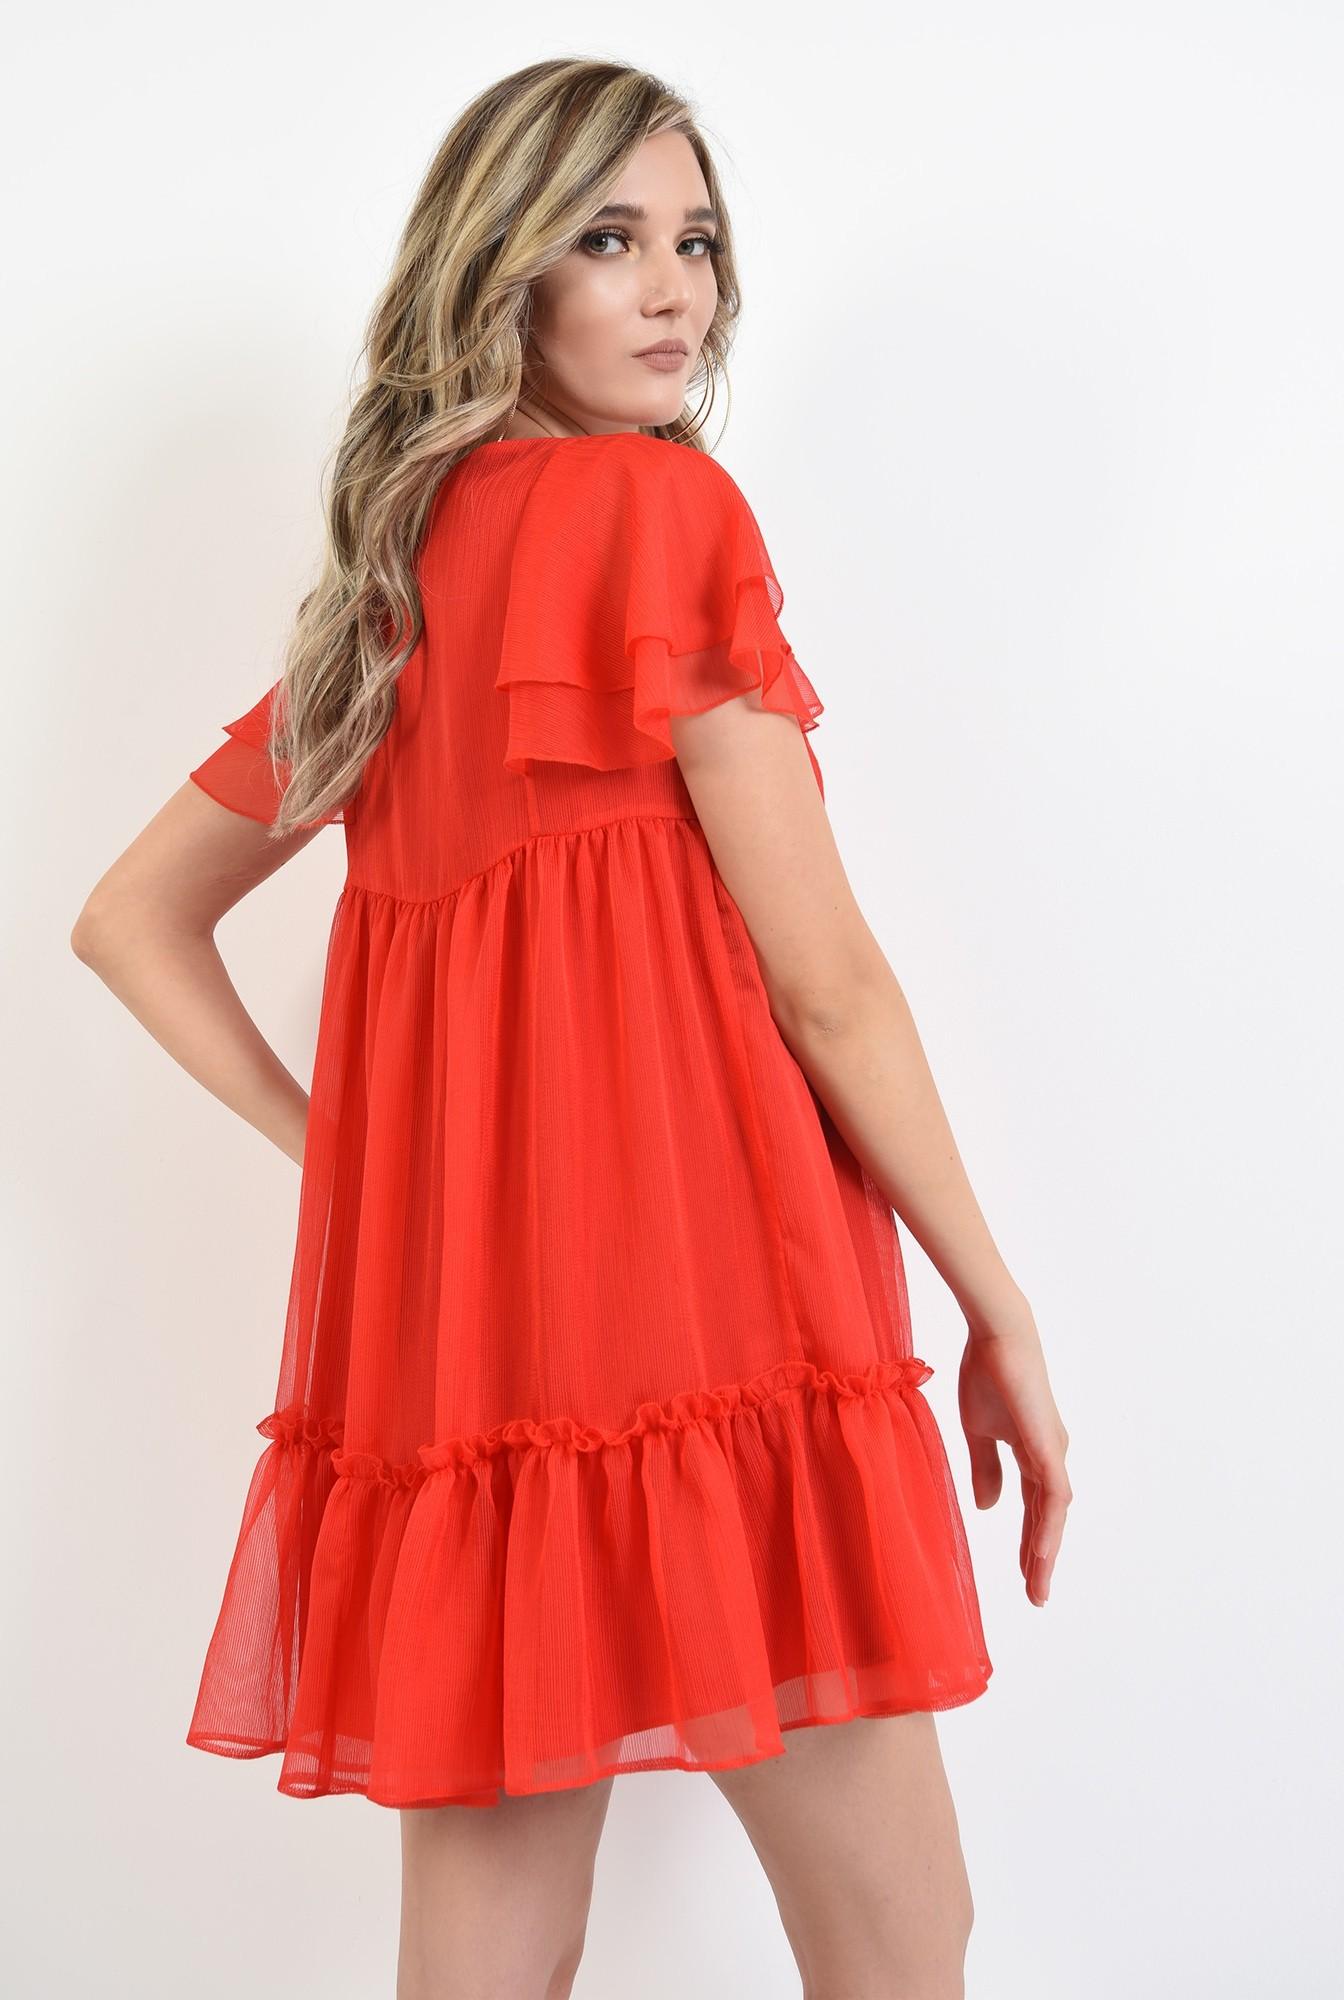 2 - 360 - rochie scurta, de vara, rosie, cu volane, Poema